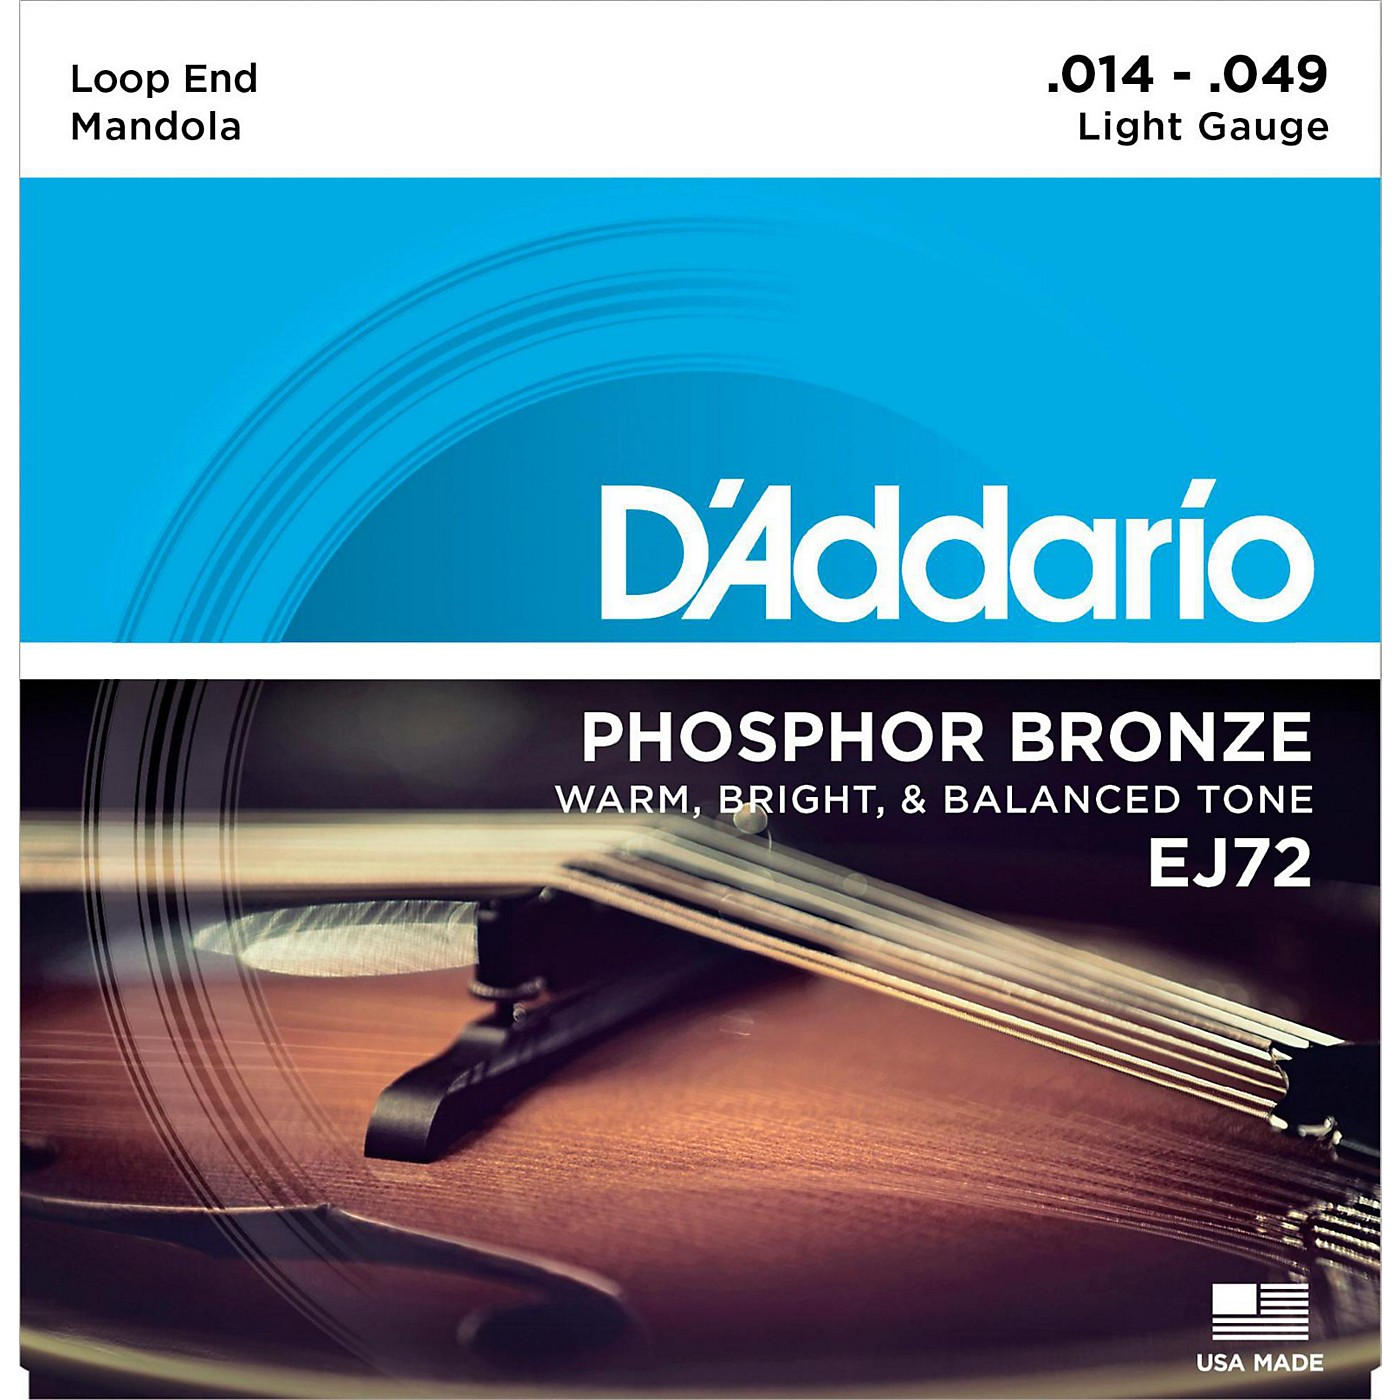 D'Addario EJ72 Phosphor Bronze Light Mandola Strings (14-49) thumbnail